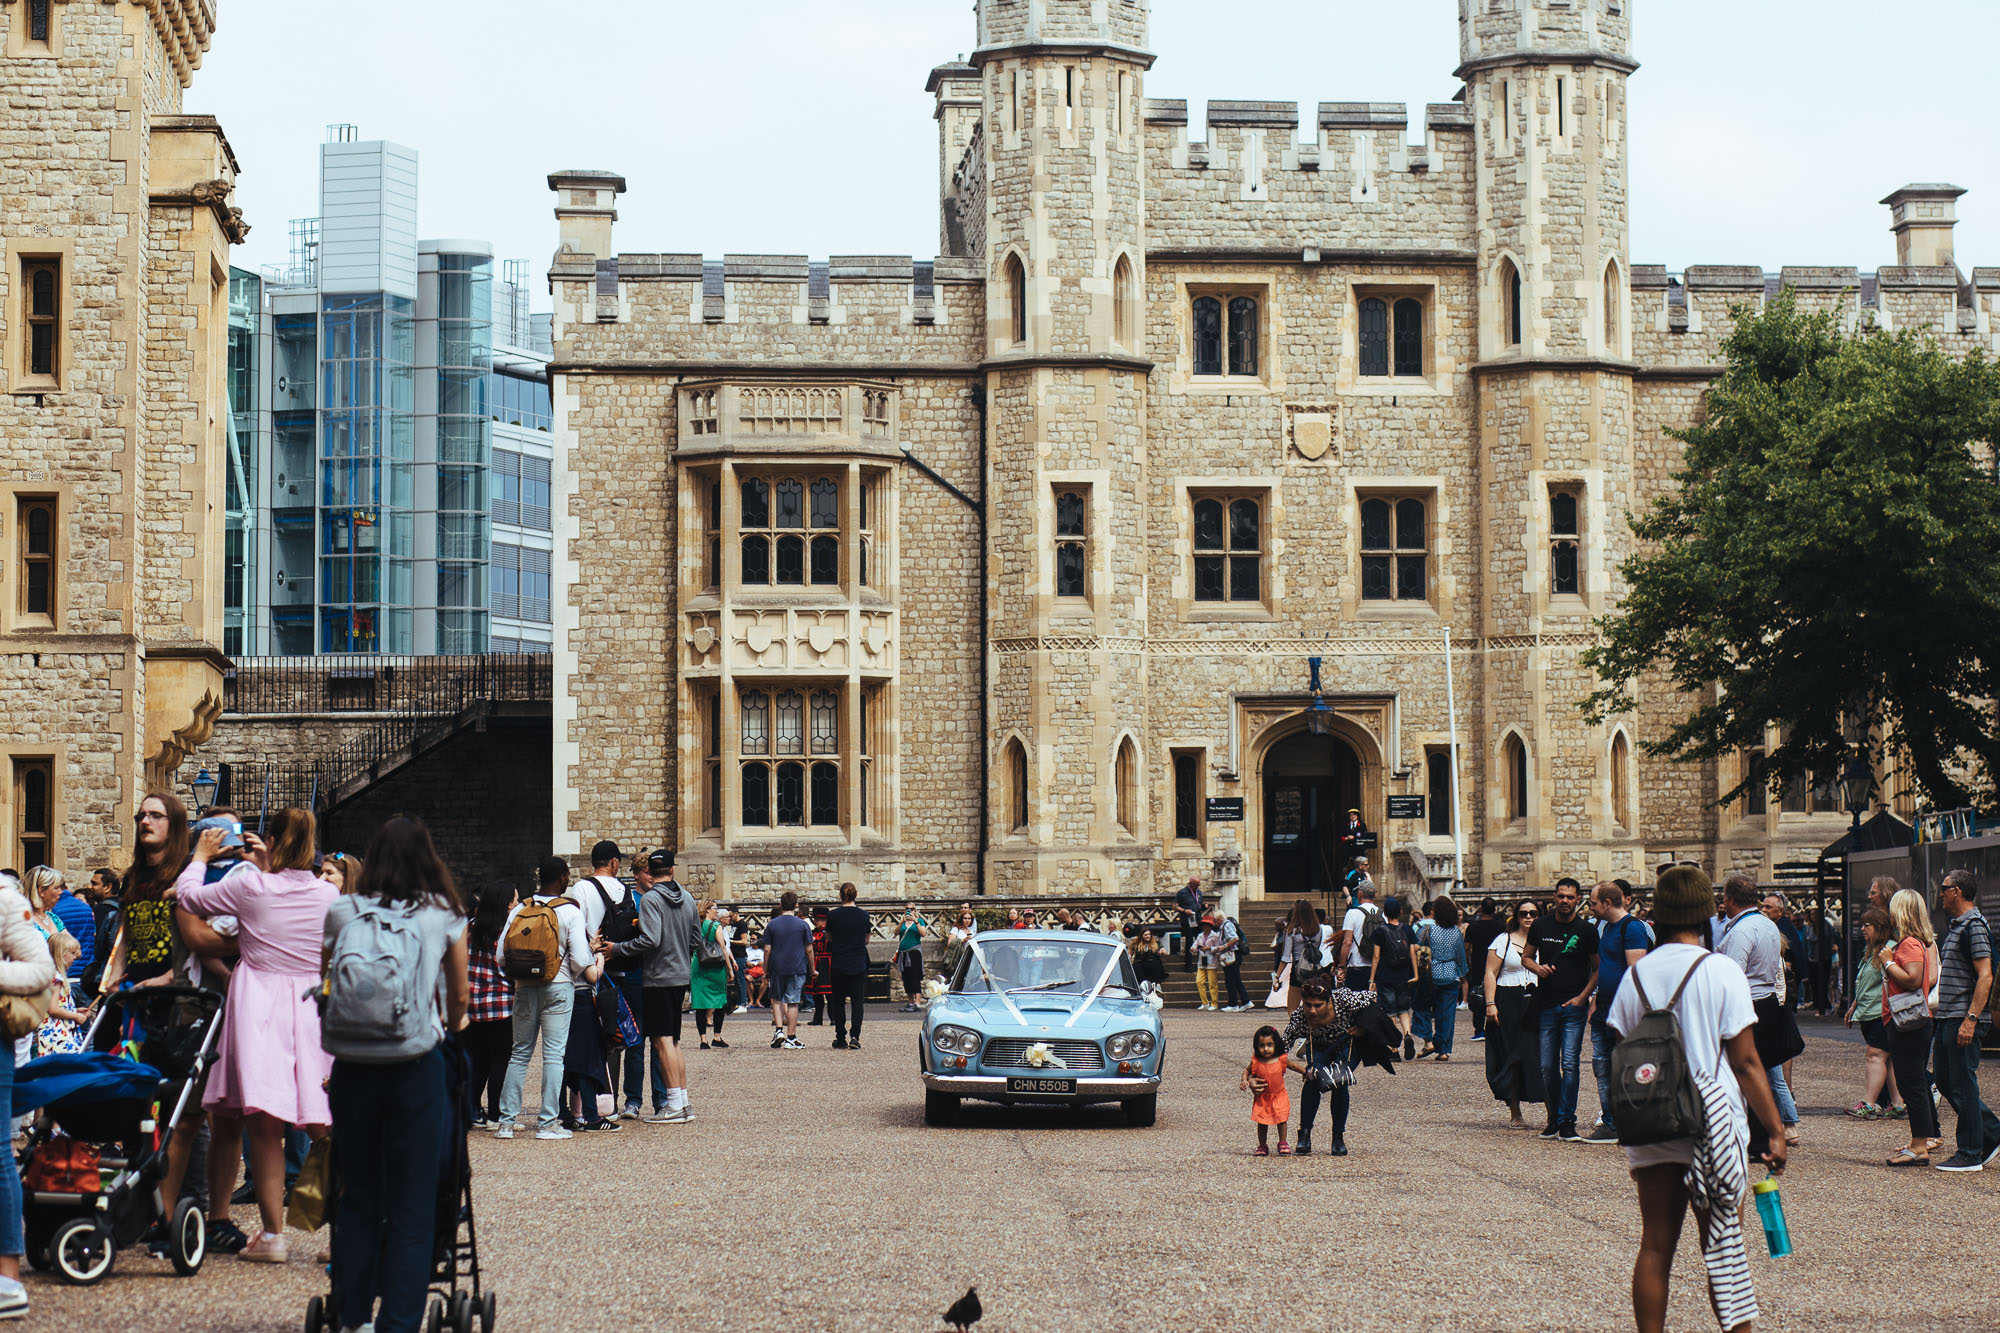 Tower of London wedding